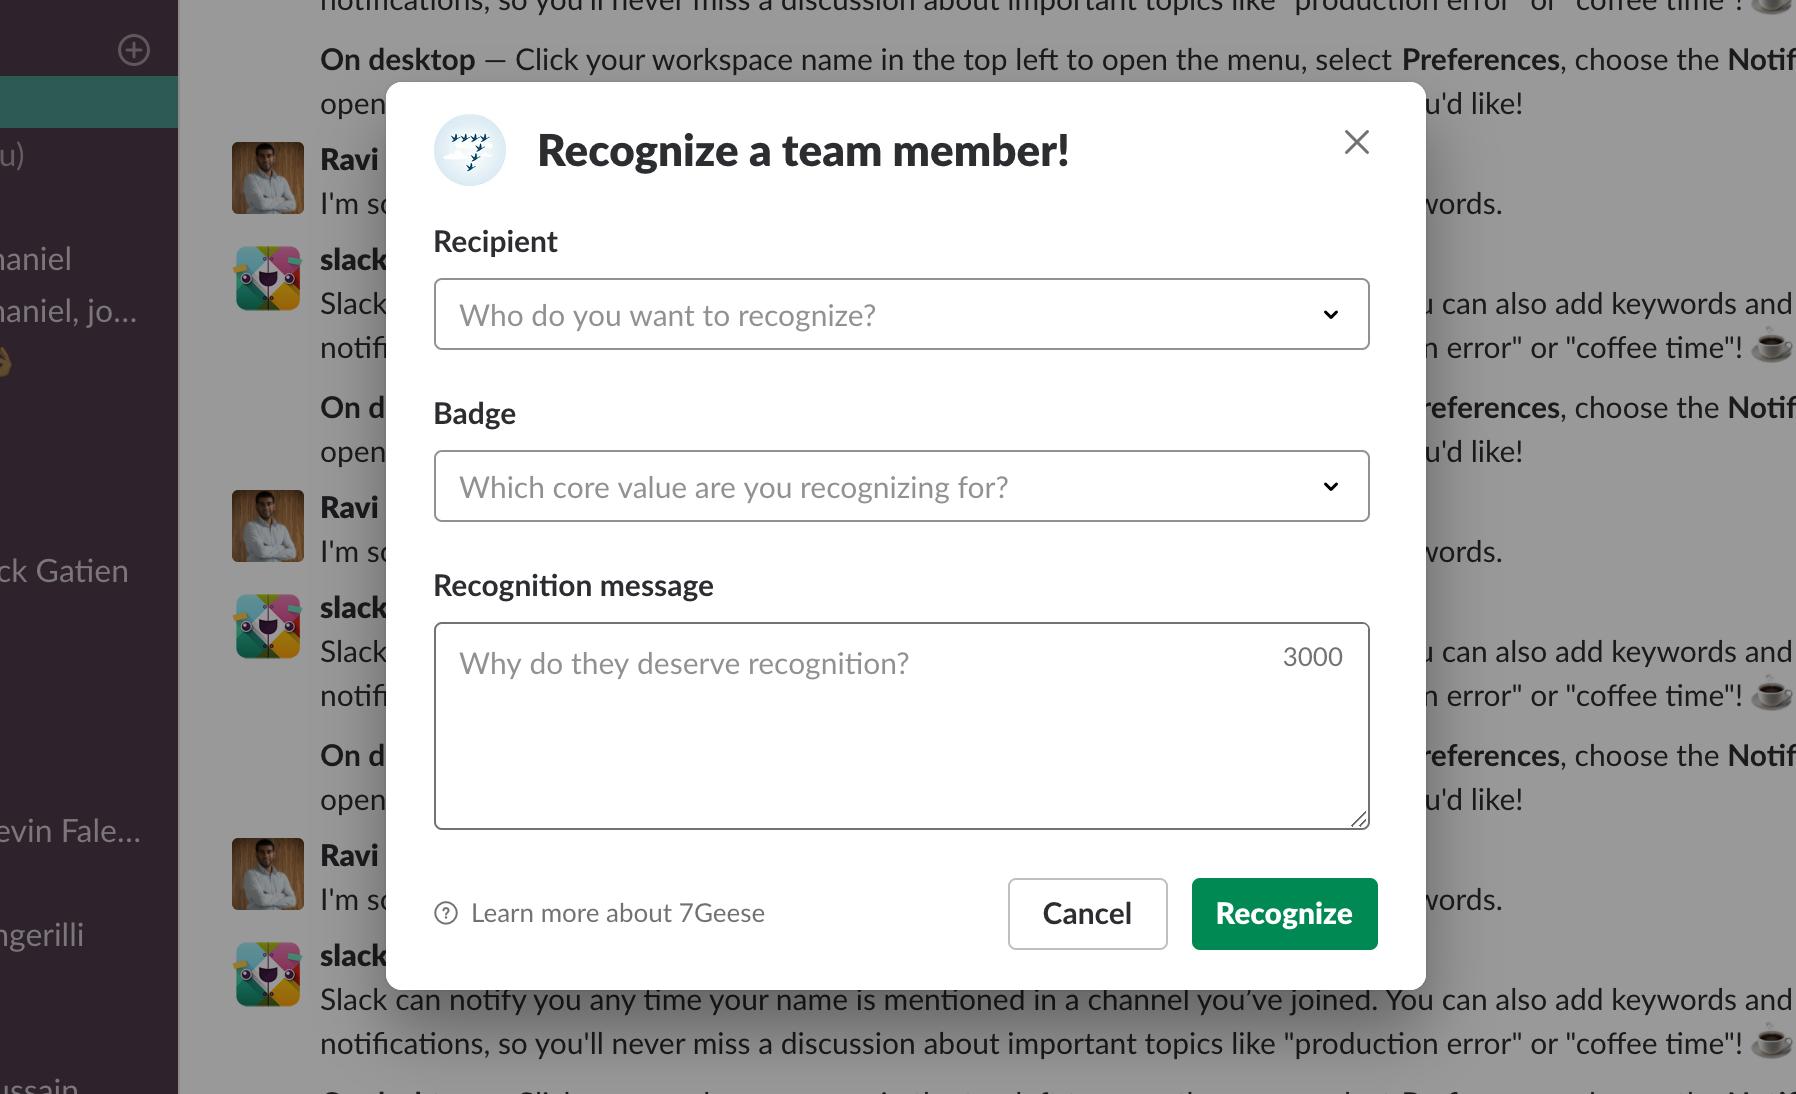 Recognizing a team member